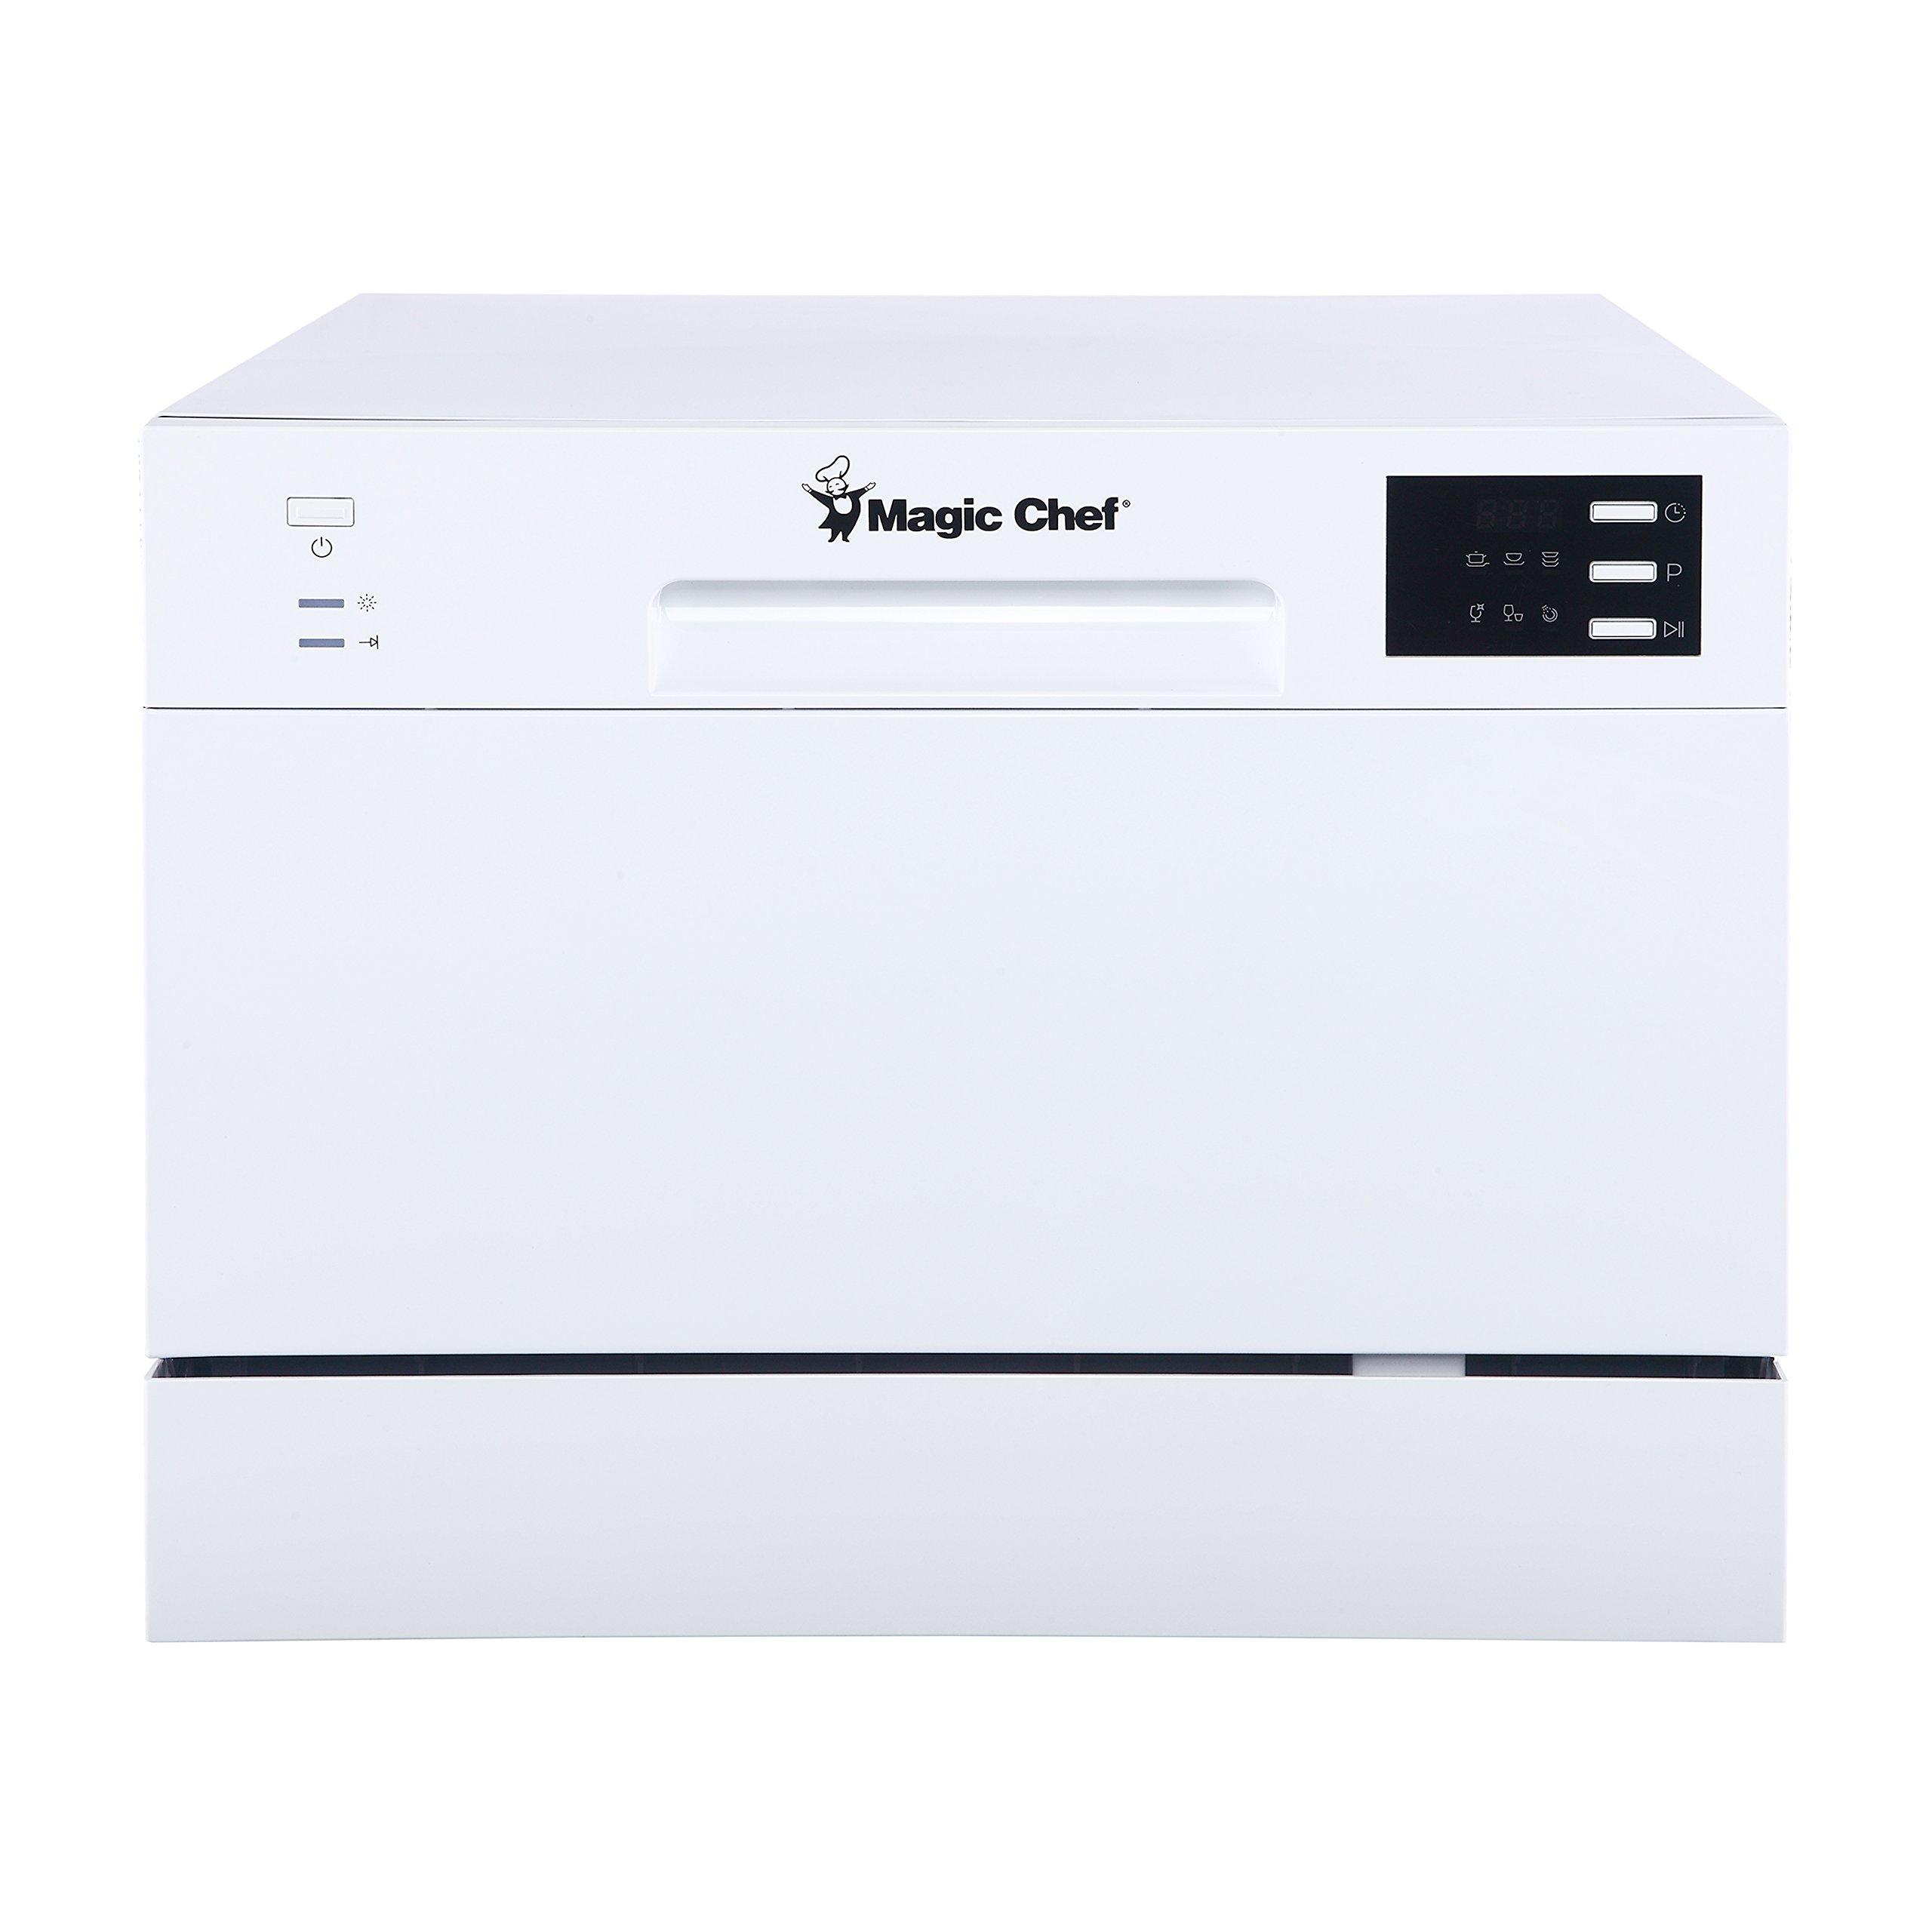 Magic Chef MCSCD6W5 6 Plate Countertop Dishwasher, White by Magic Chef